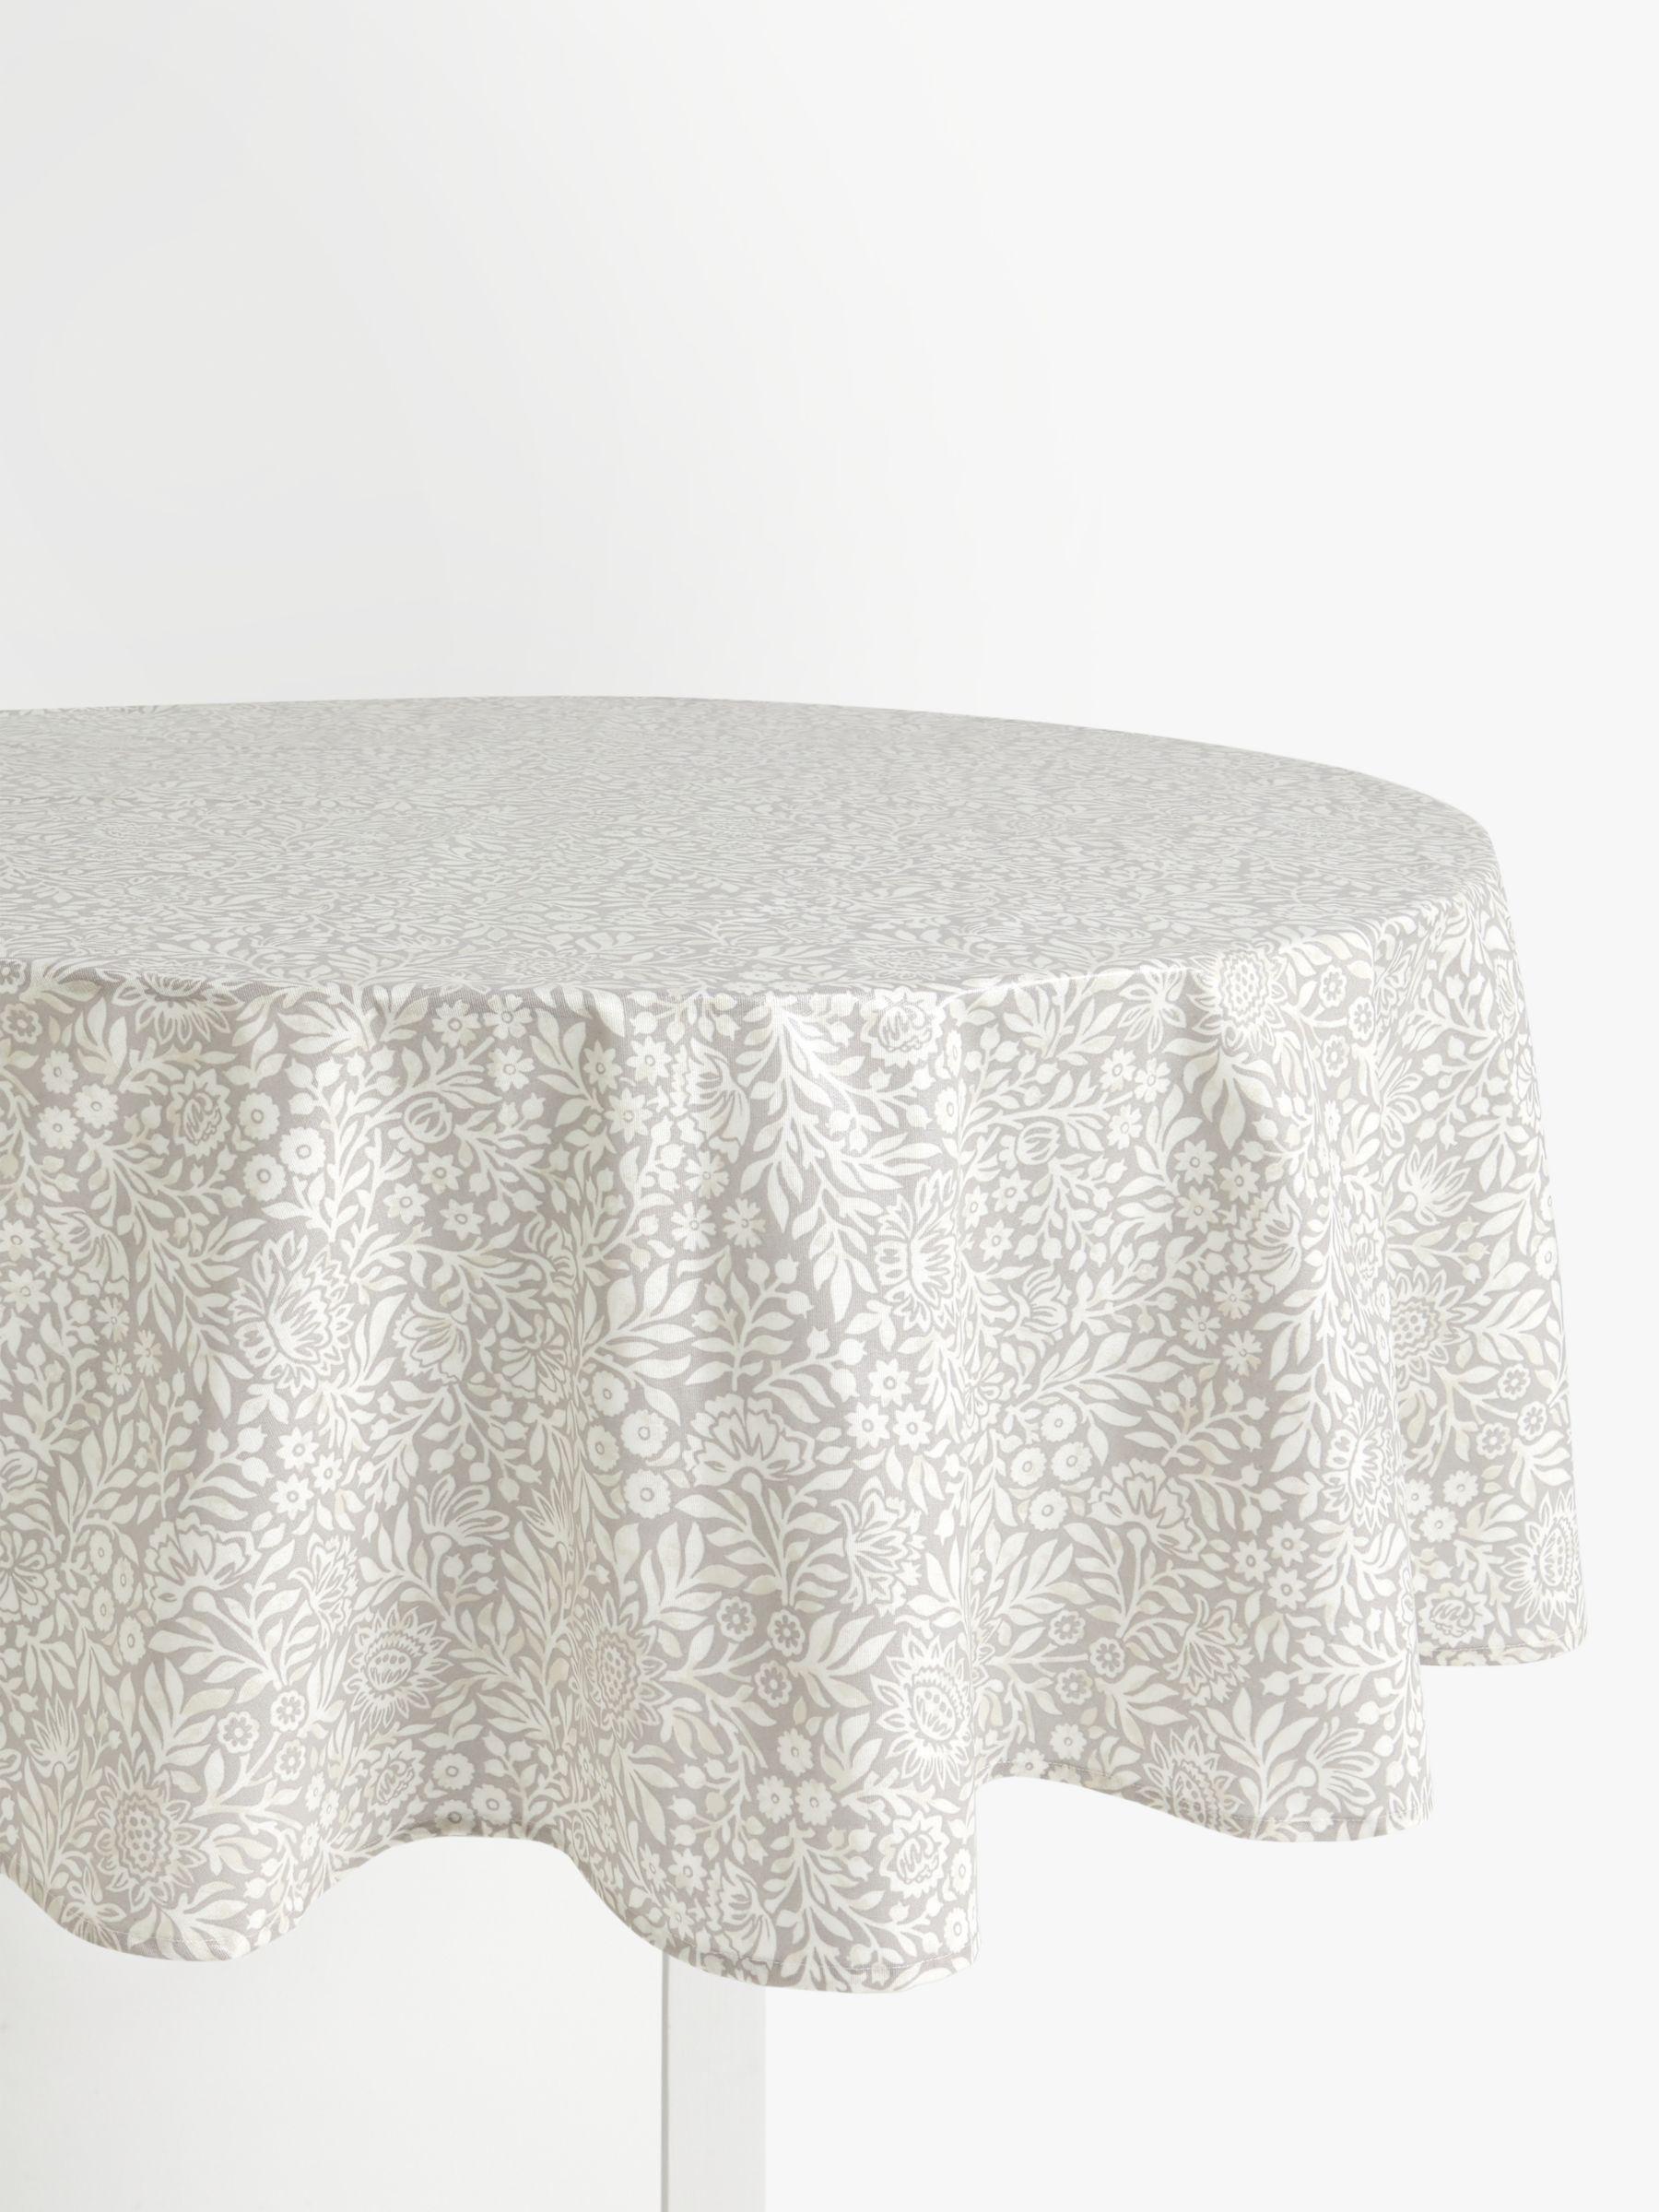 Wipe Clean Tablecloths Plastic Tablecloths John Lewis Partners